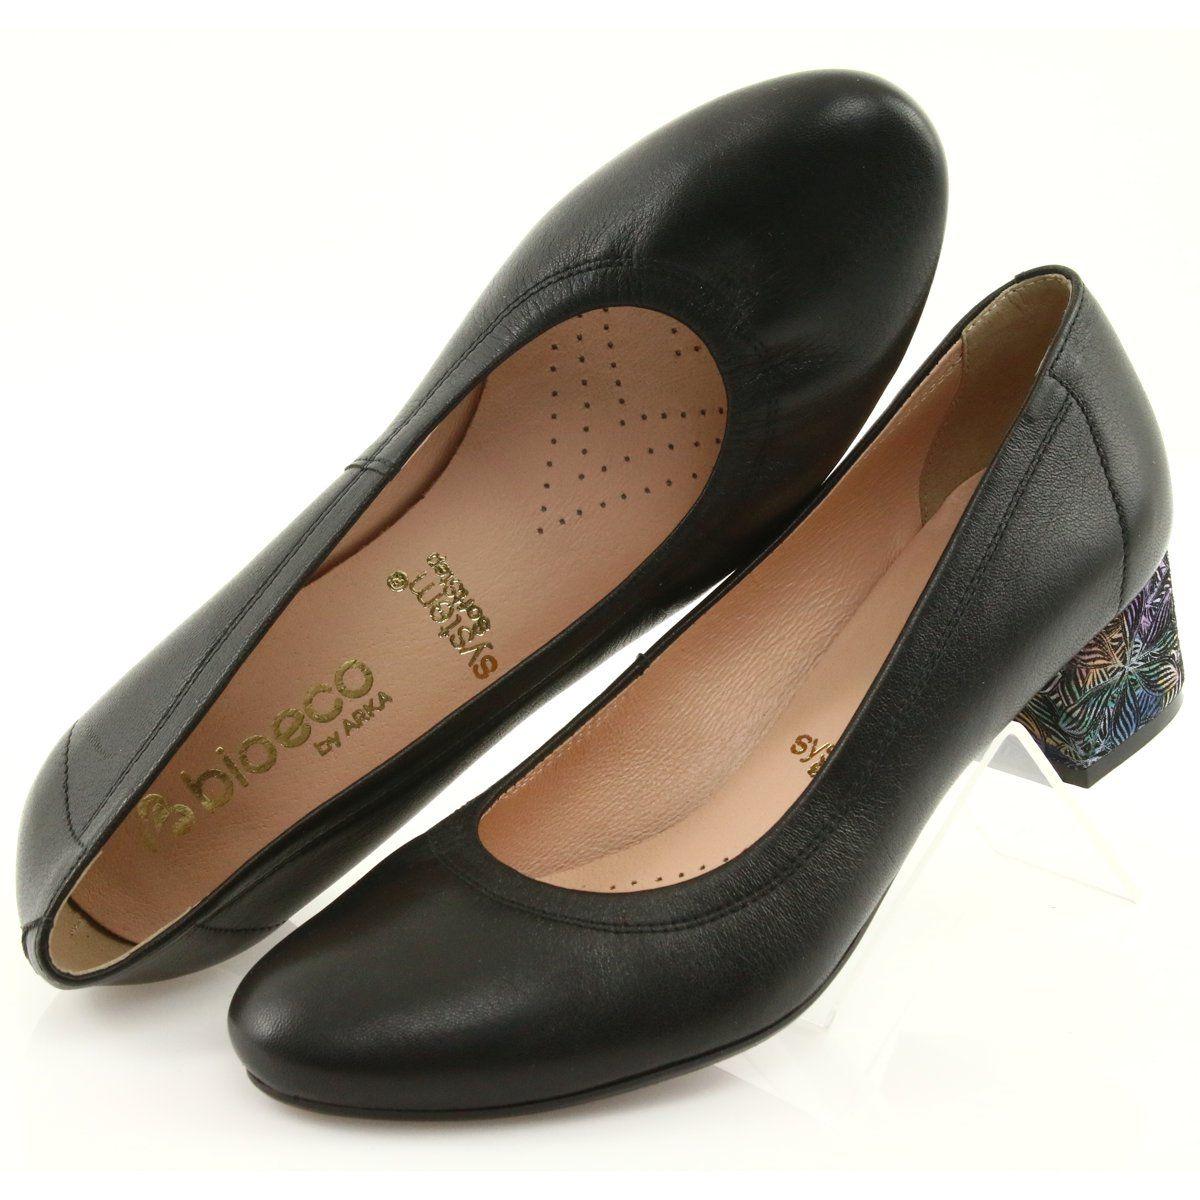 Wygodne Czolenka Damskie Skorzane Arka 5627 Czarne Leather Shoes Woman Shoes Women Shoes